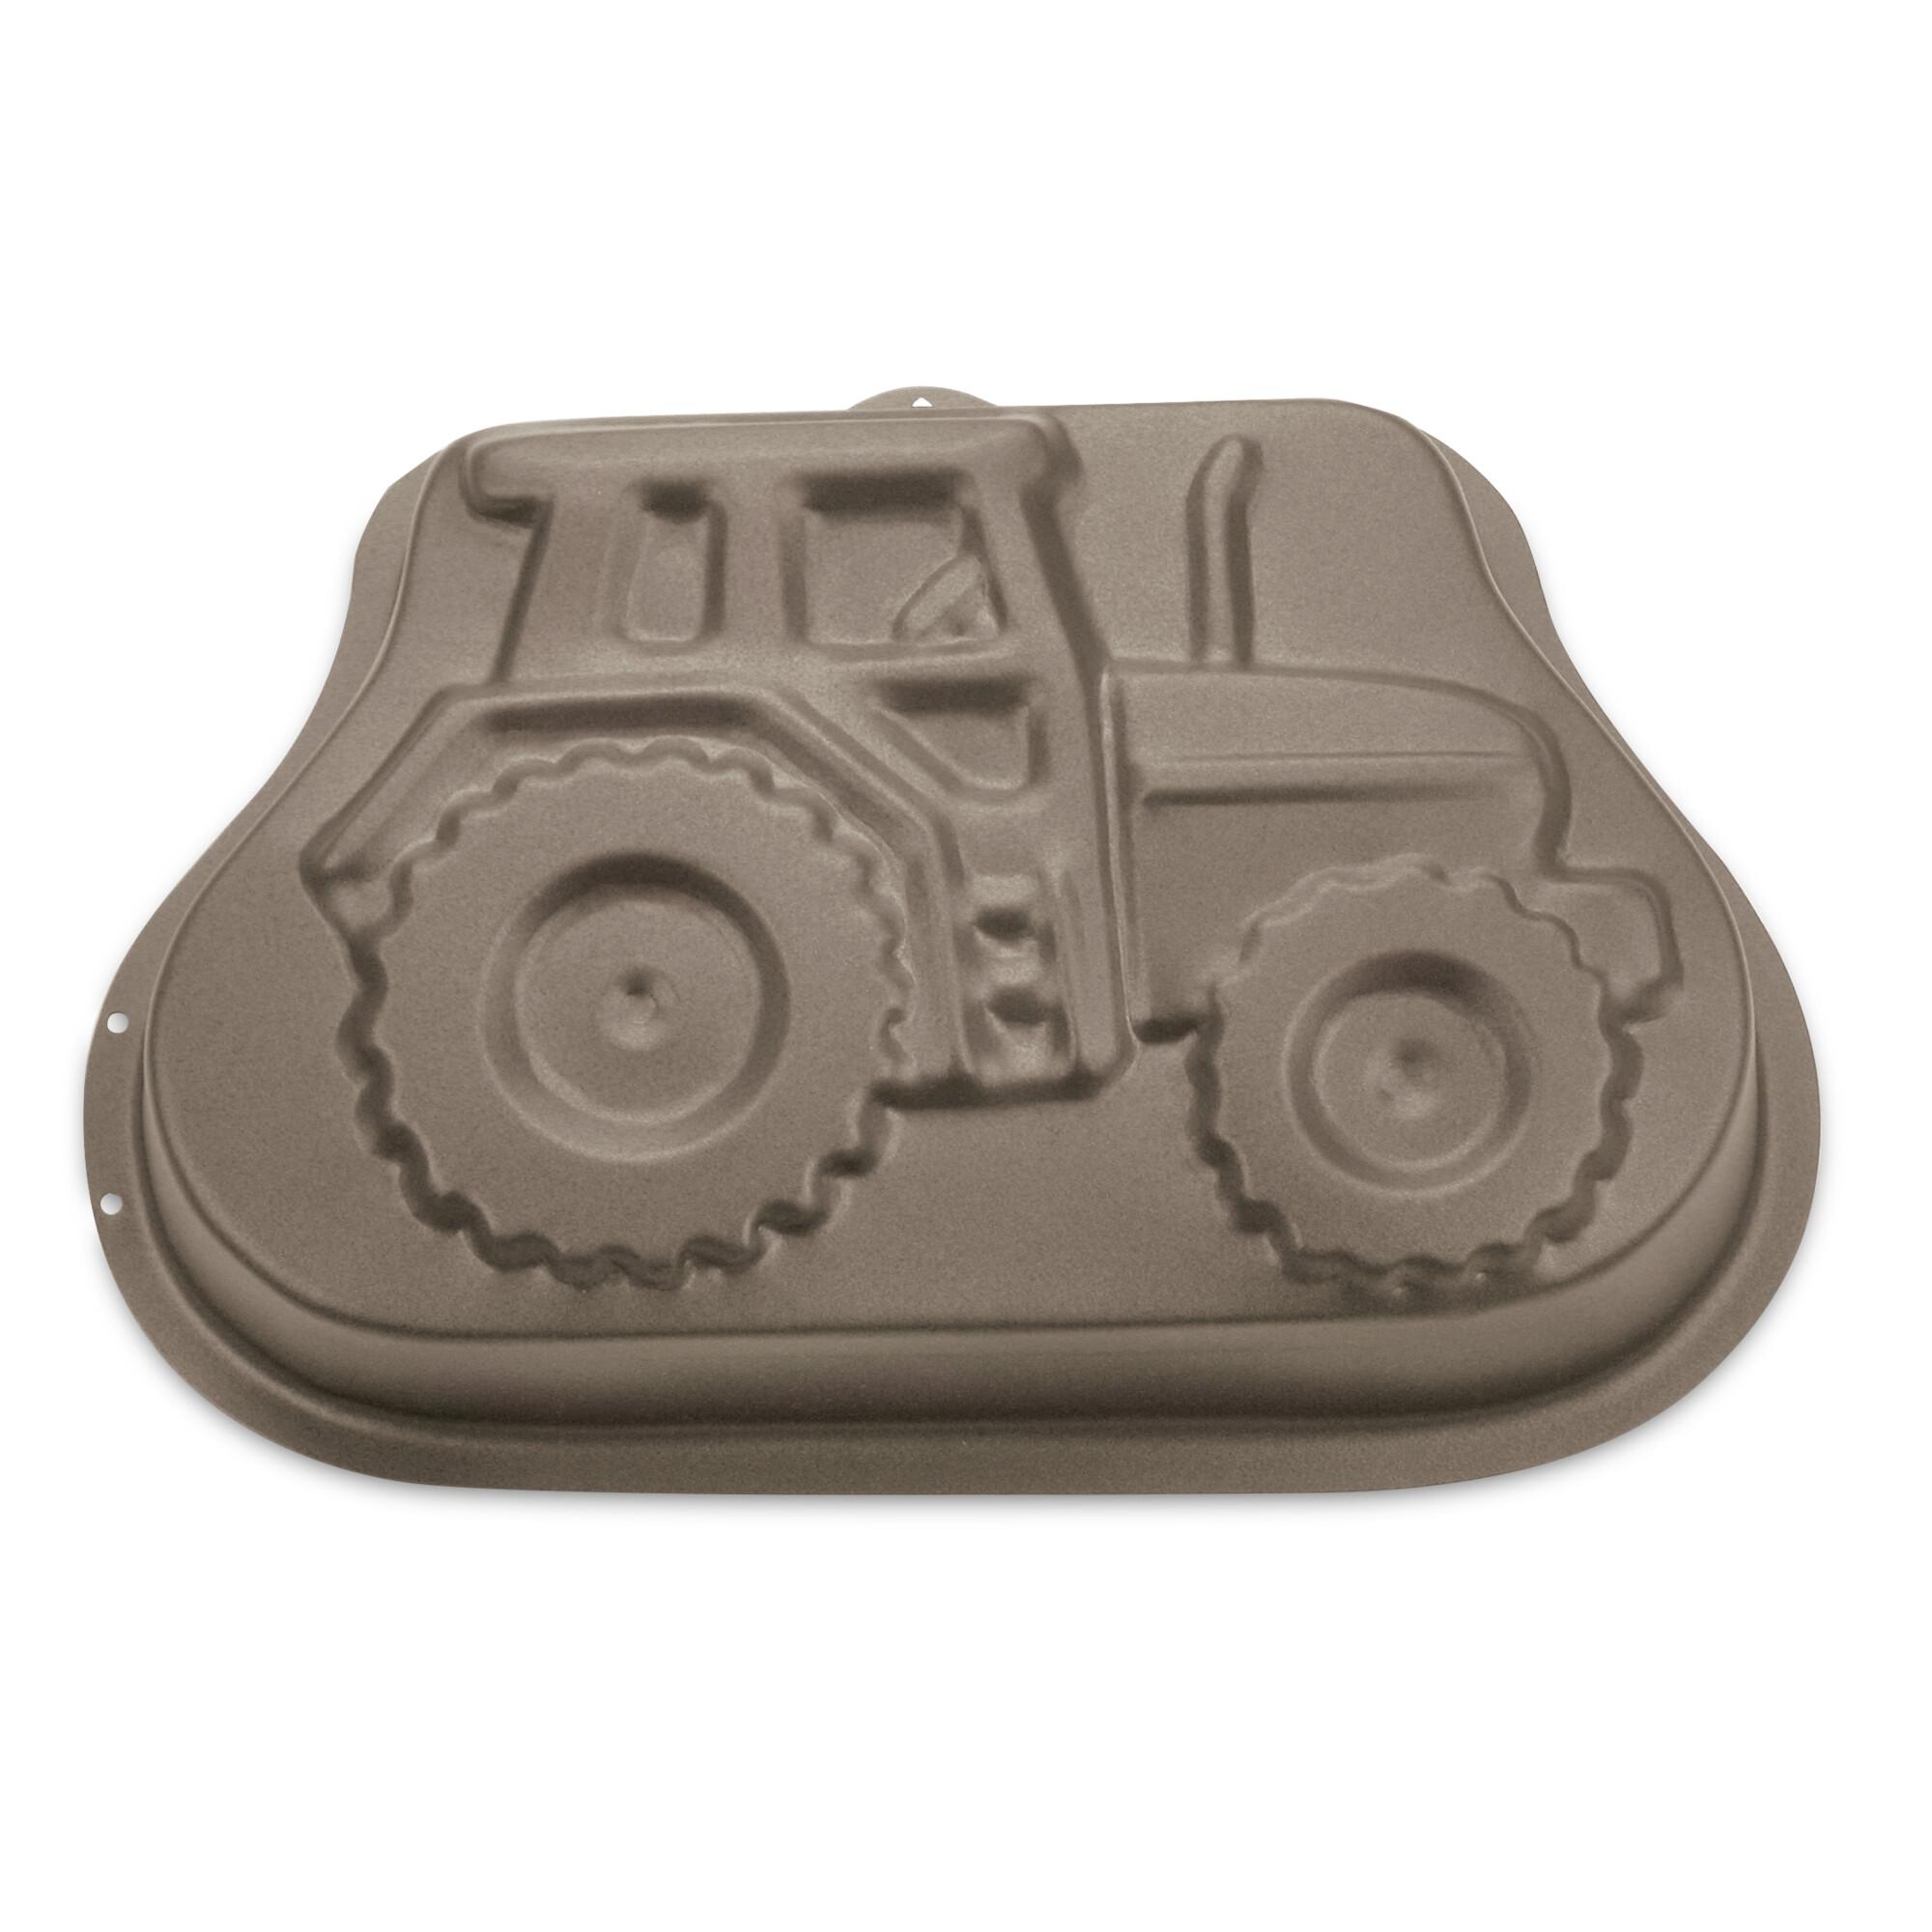 Cake mould - Schorsch the tractor